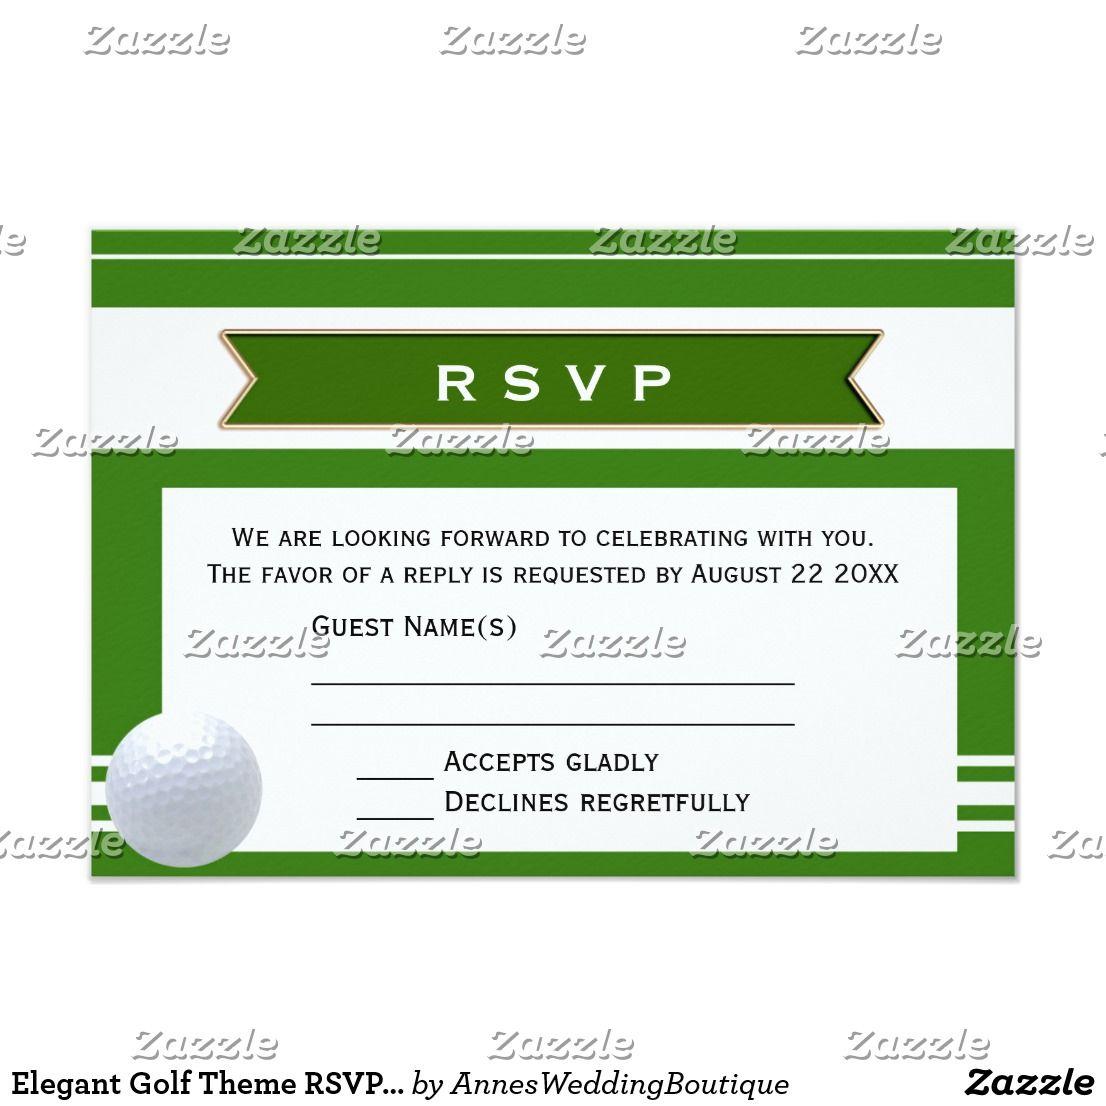 Elegant golf theme rsvp wedding invitation card zazzle